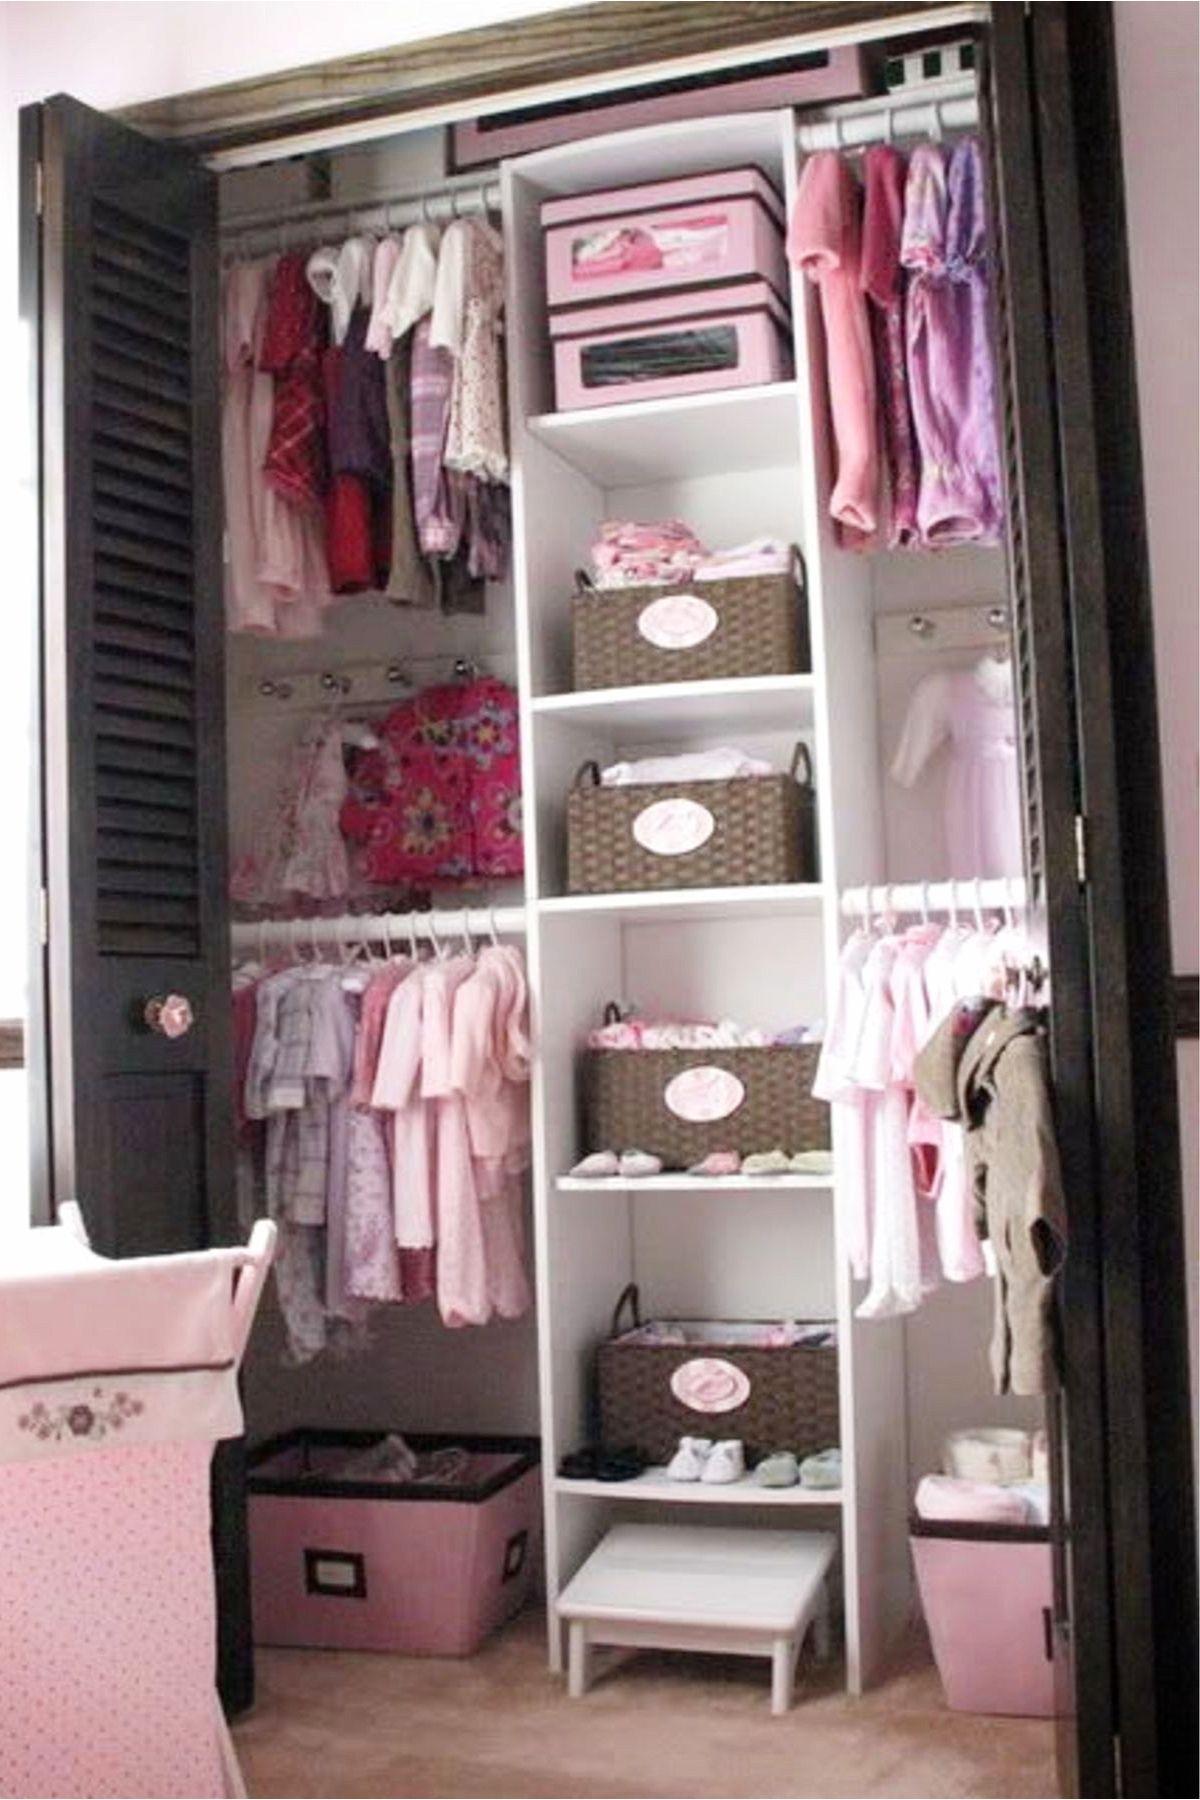 Baby Closet Ideas: 28 Nursery Closet Organization, Storage and